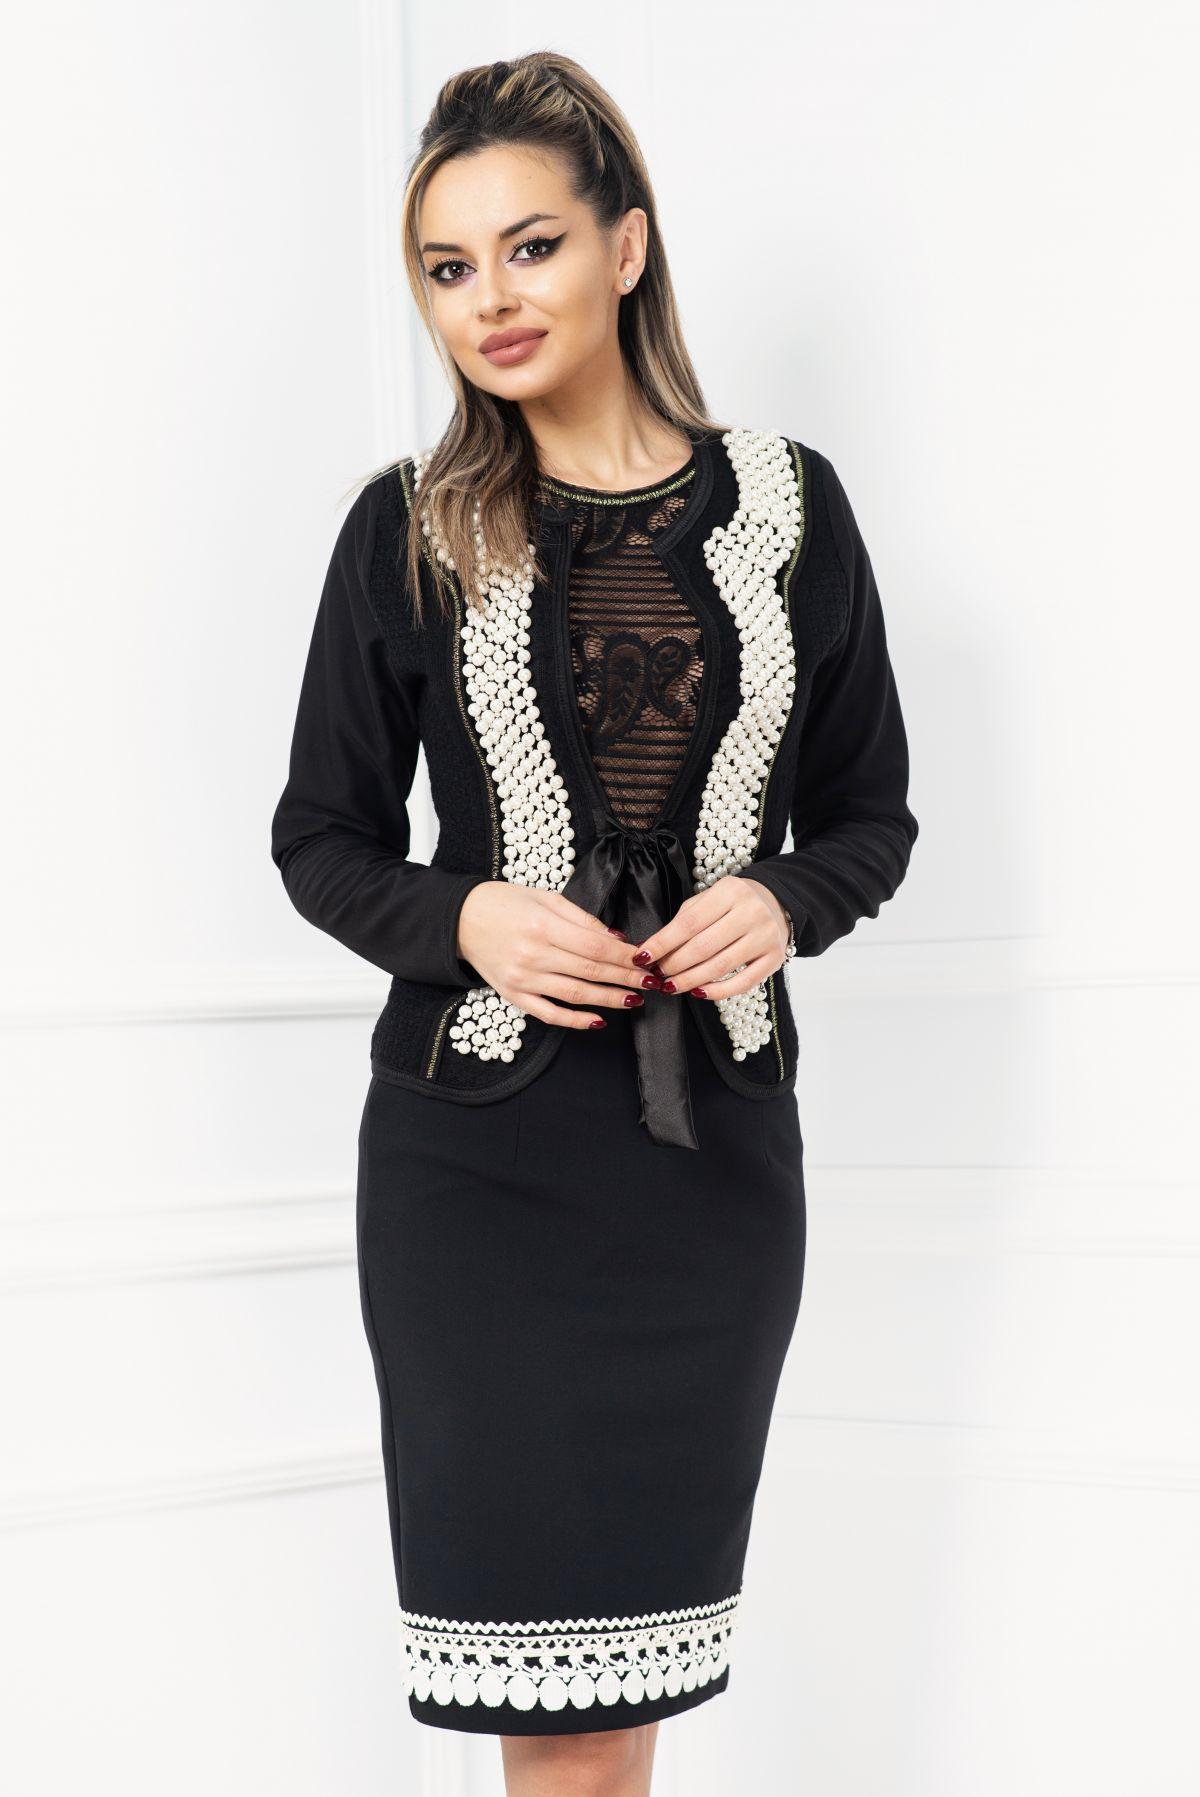 Jacheta eleganta neagra cu perle aplicate si insertii de fir irizant